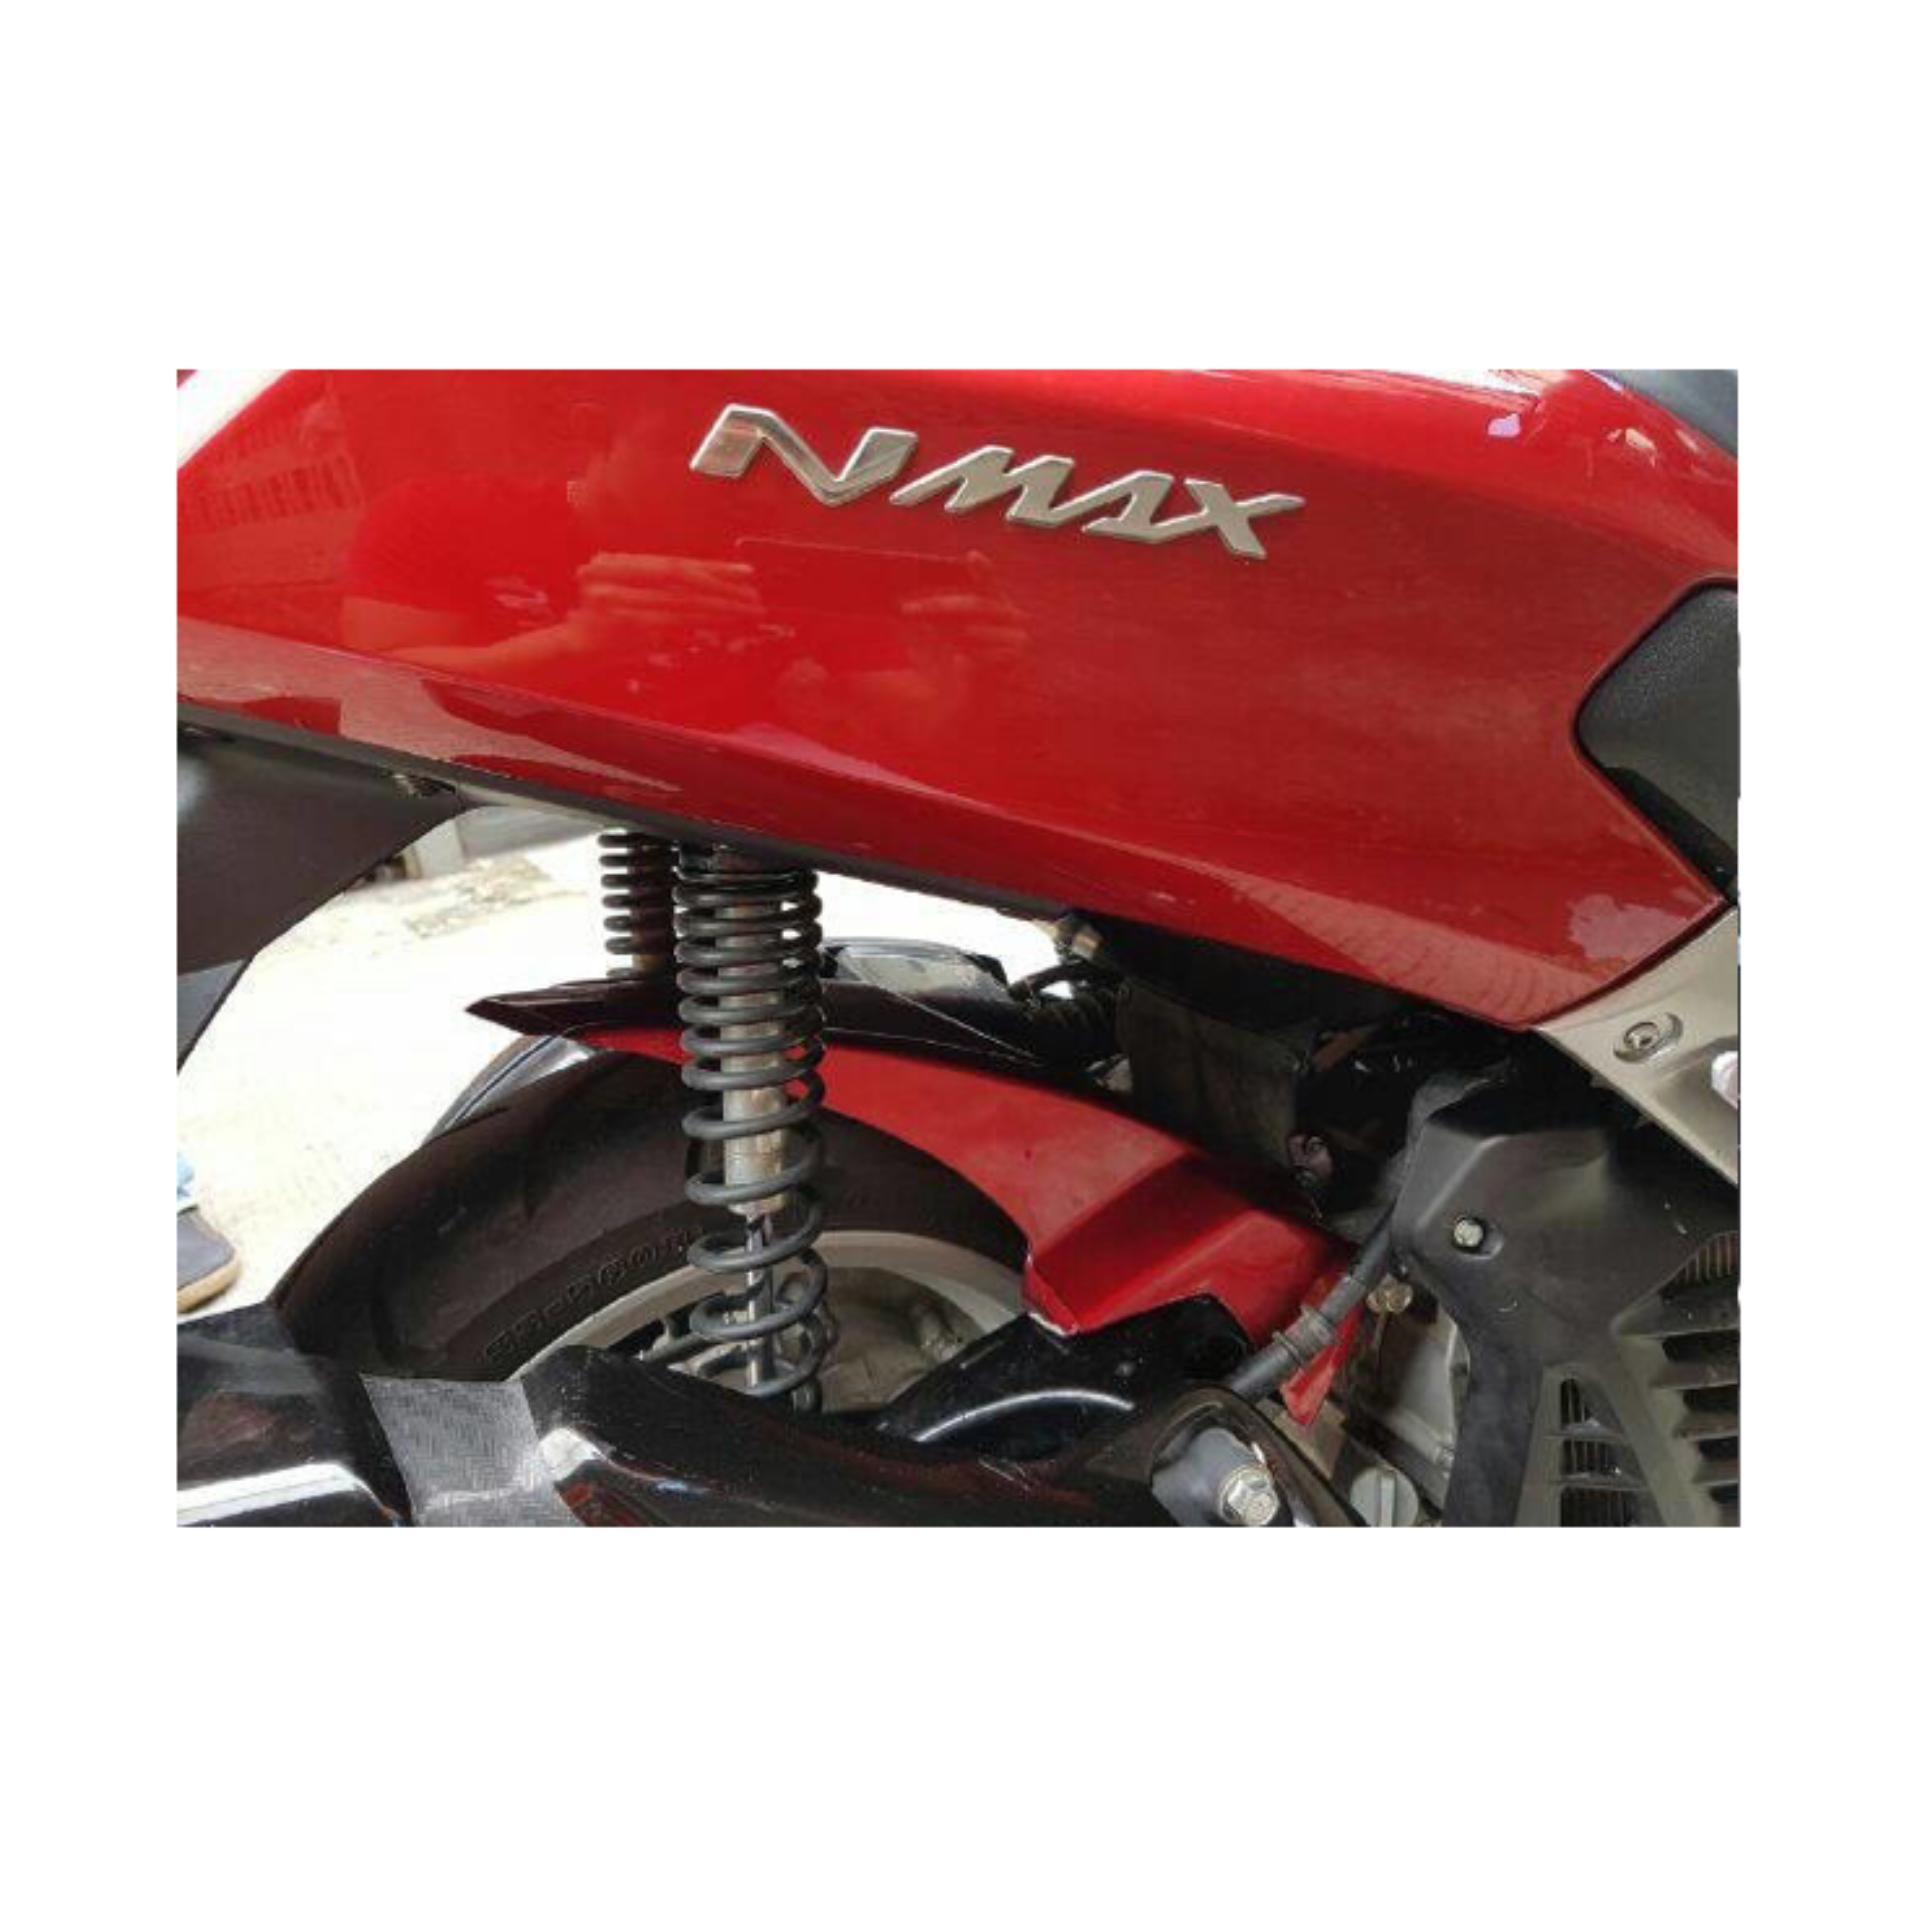 Diskon Penjualan Putih Yamaha Nmax Rear Huger Spakbor Spatbor Prospeed Black Series Jupiter Mxking150 Full Kolong Aksesorisbelakang Motor Sporty